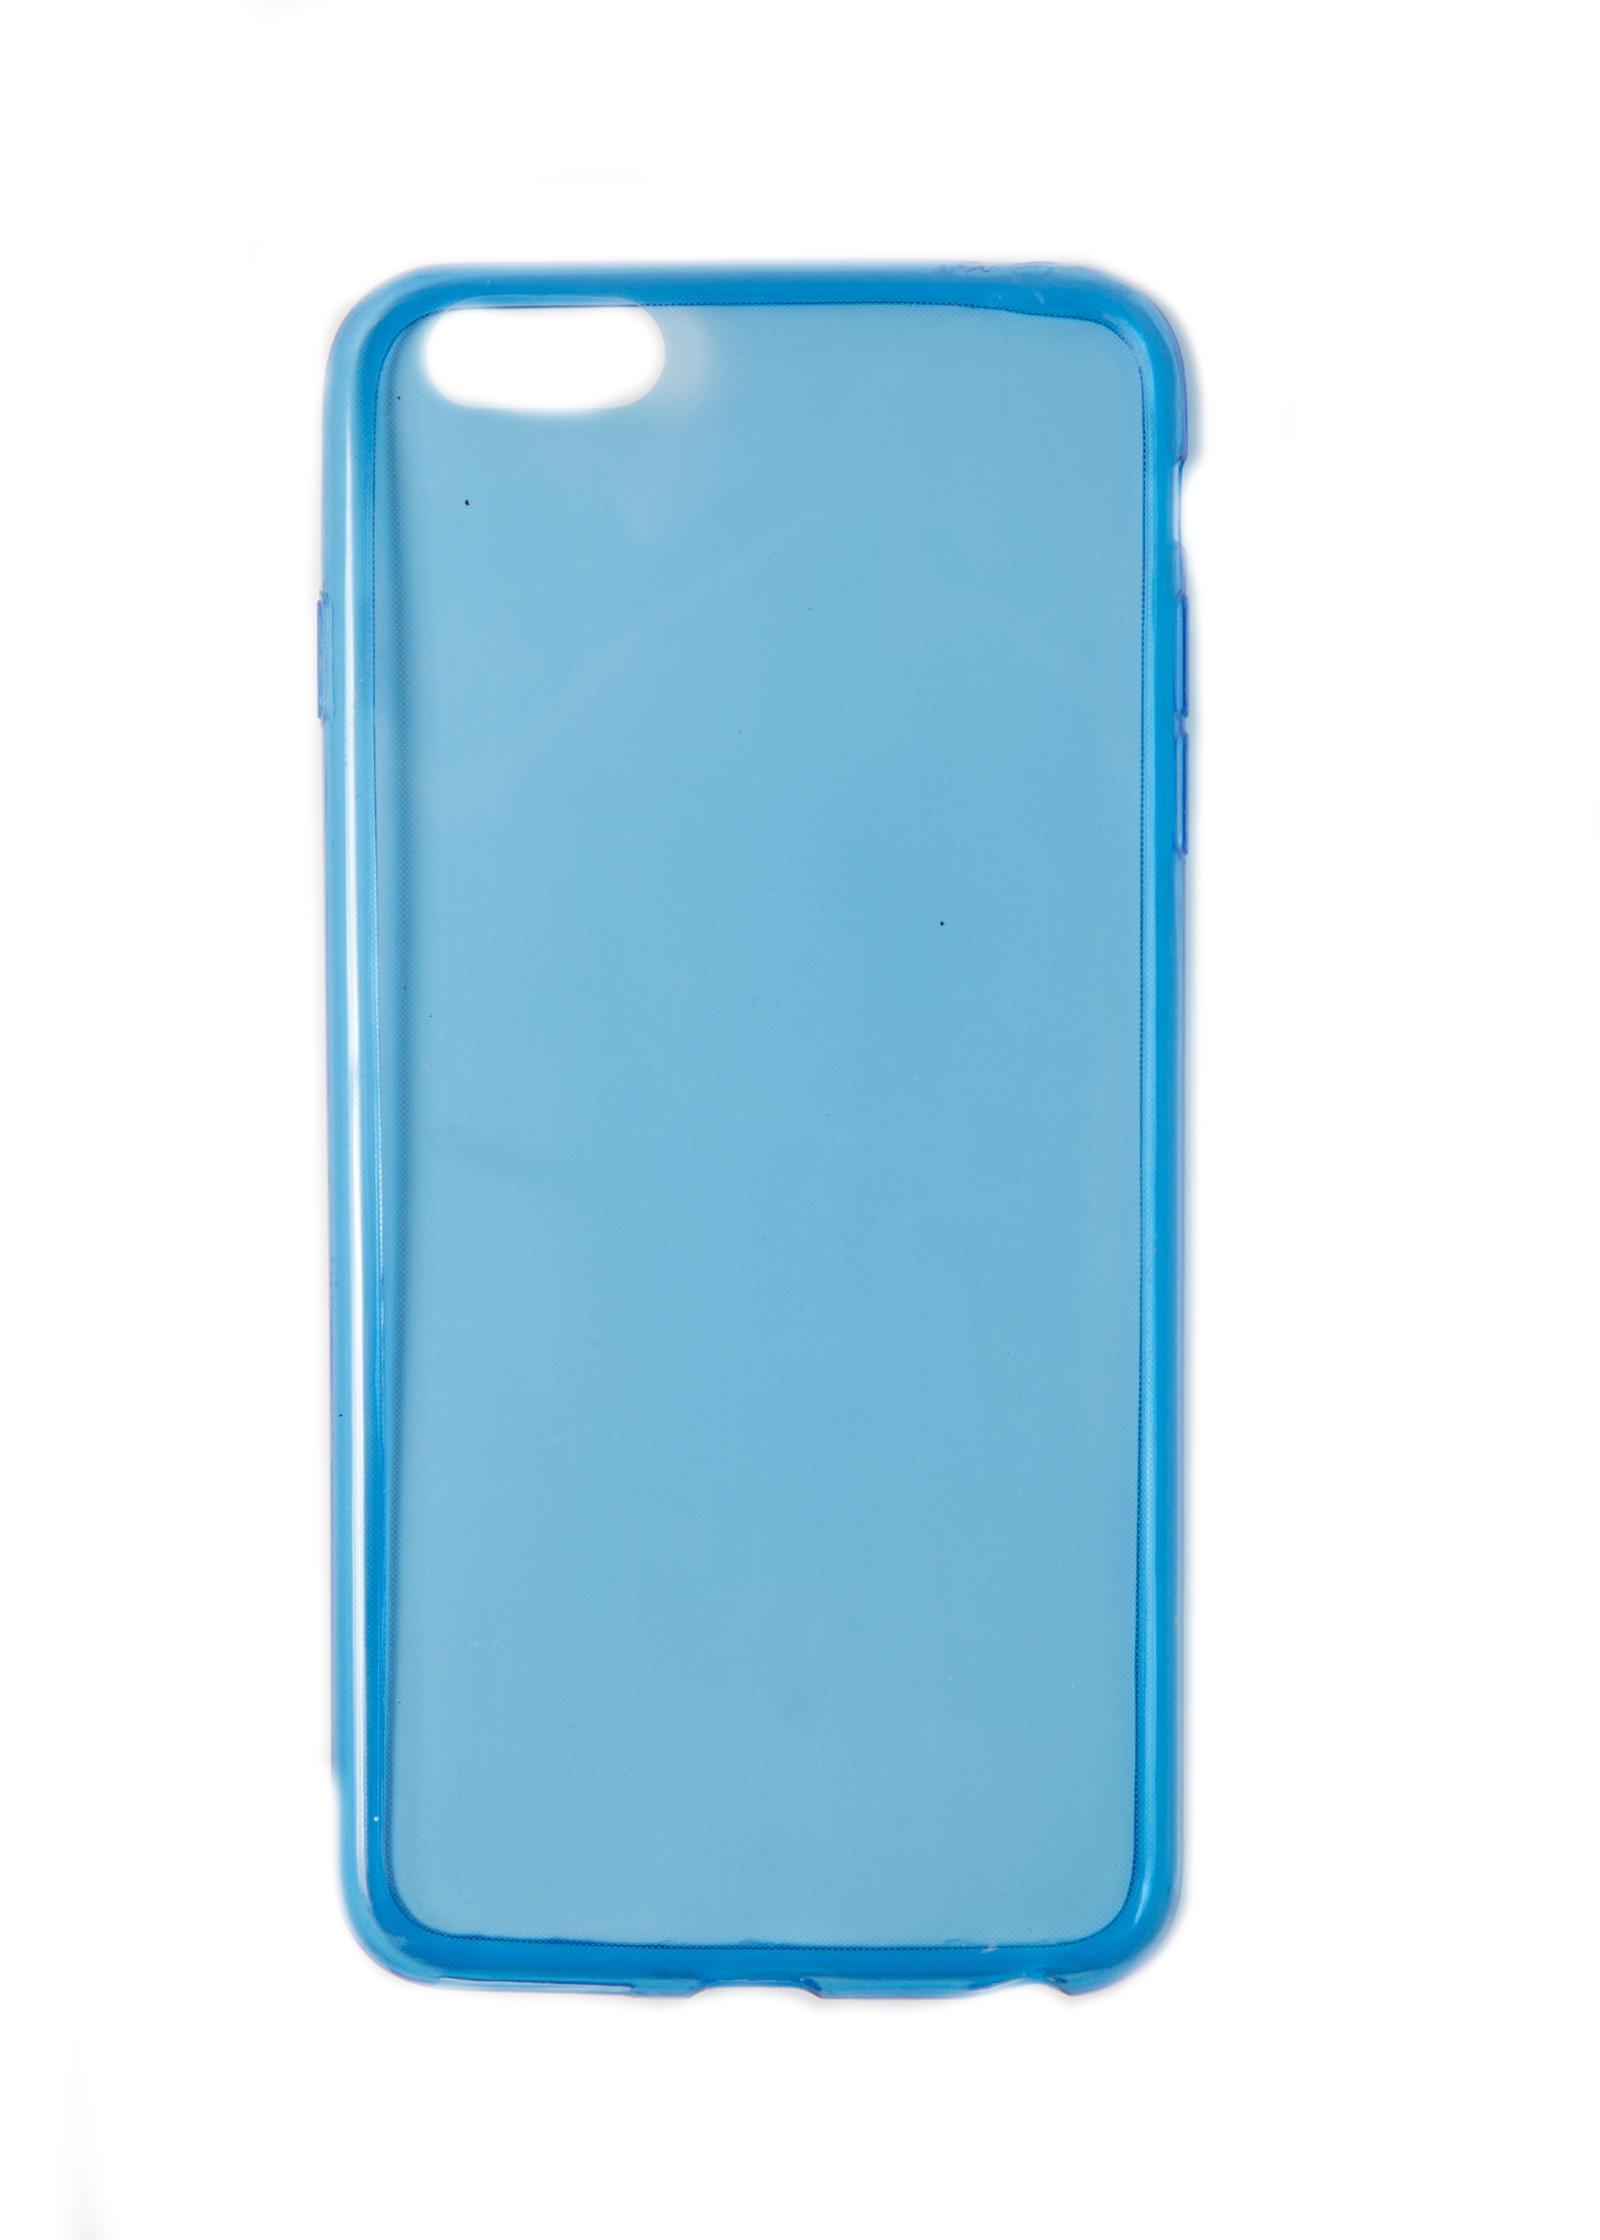 Чехол для сотового телефона Mitya Veselkov CASE, IP6.МITYA-248SIL все цены